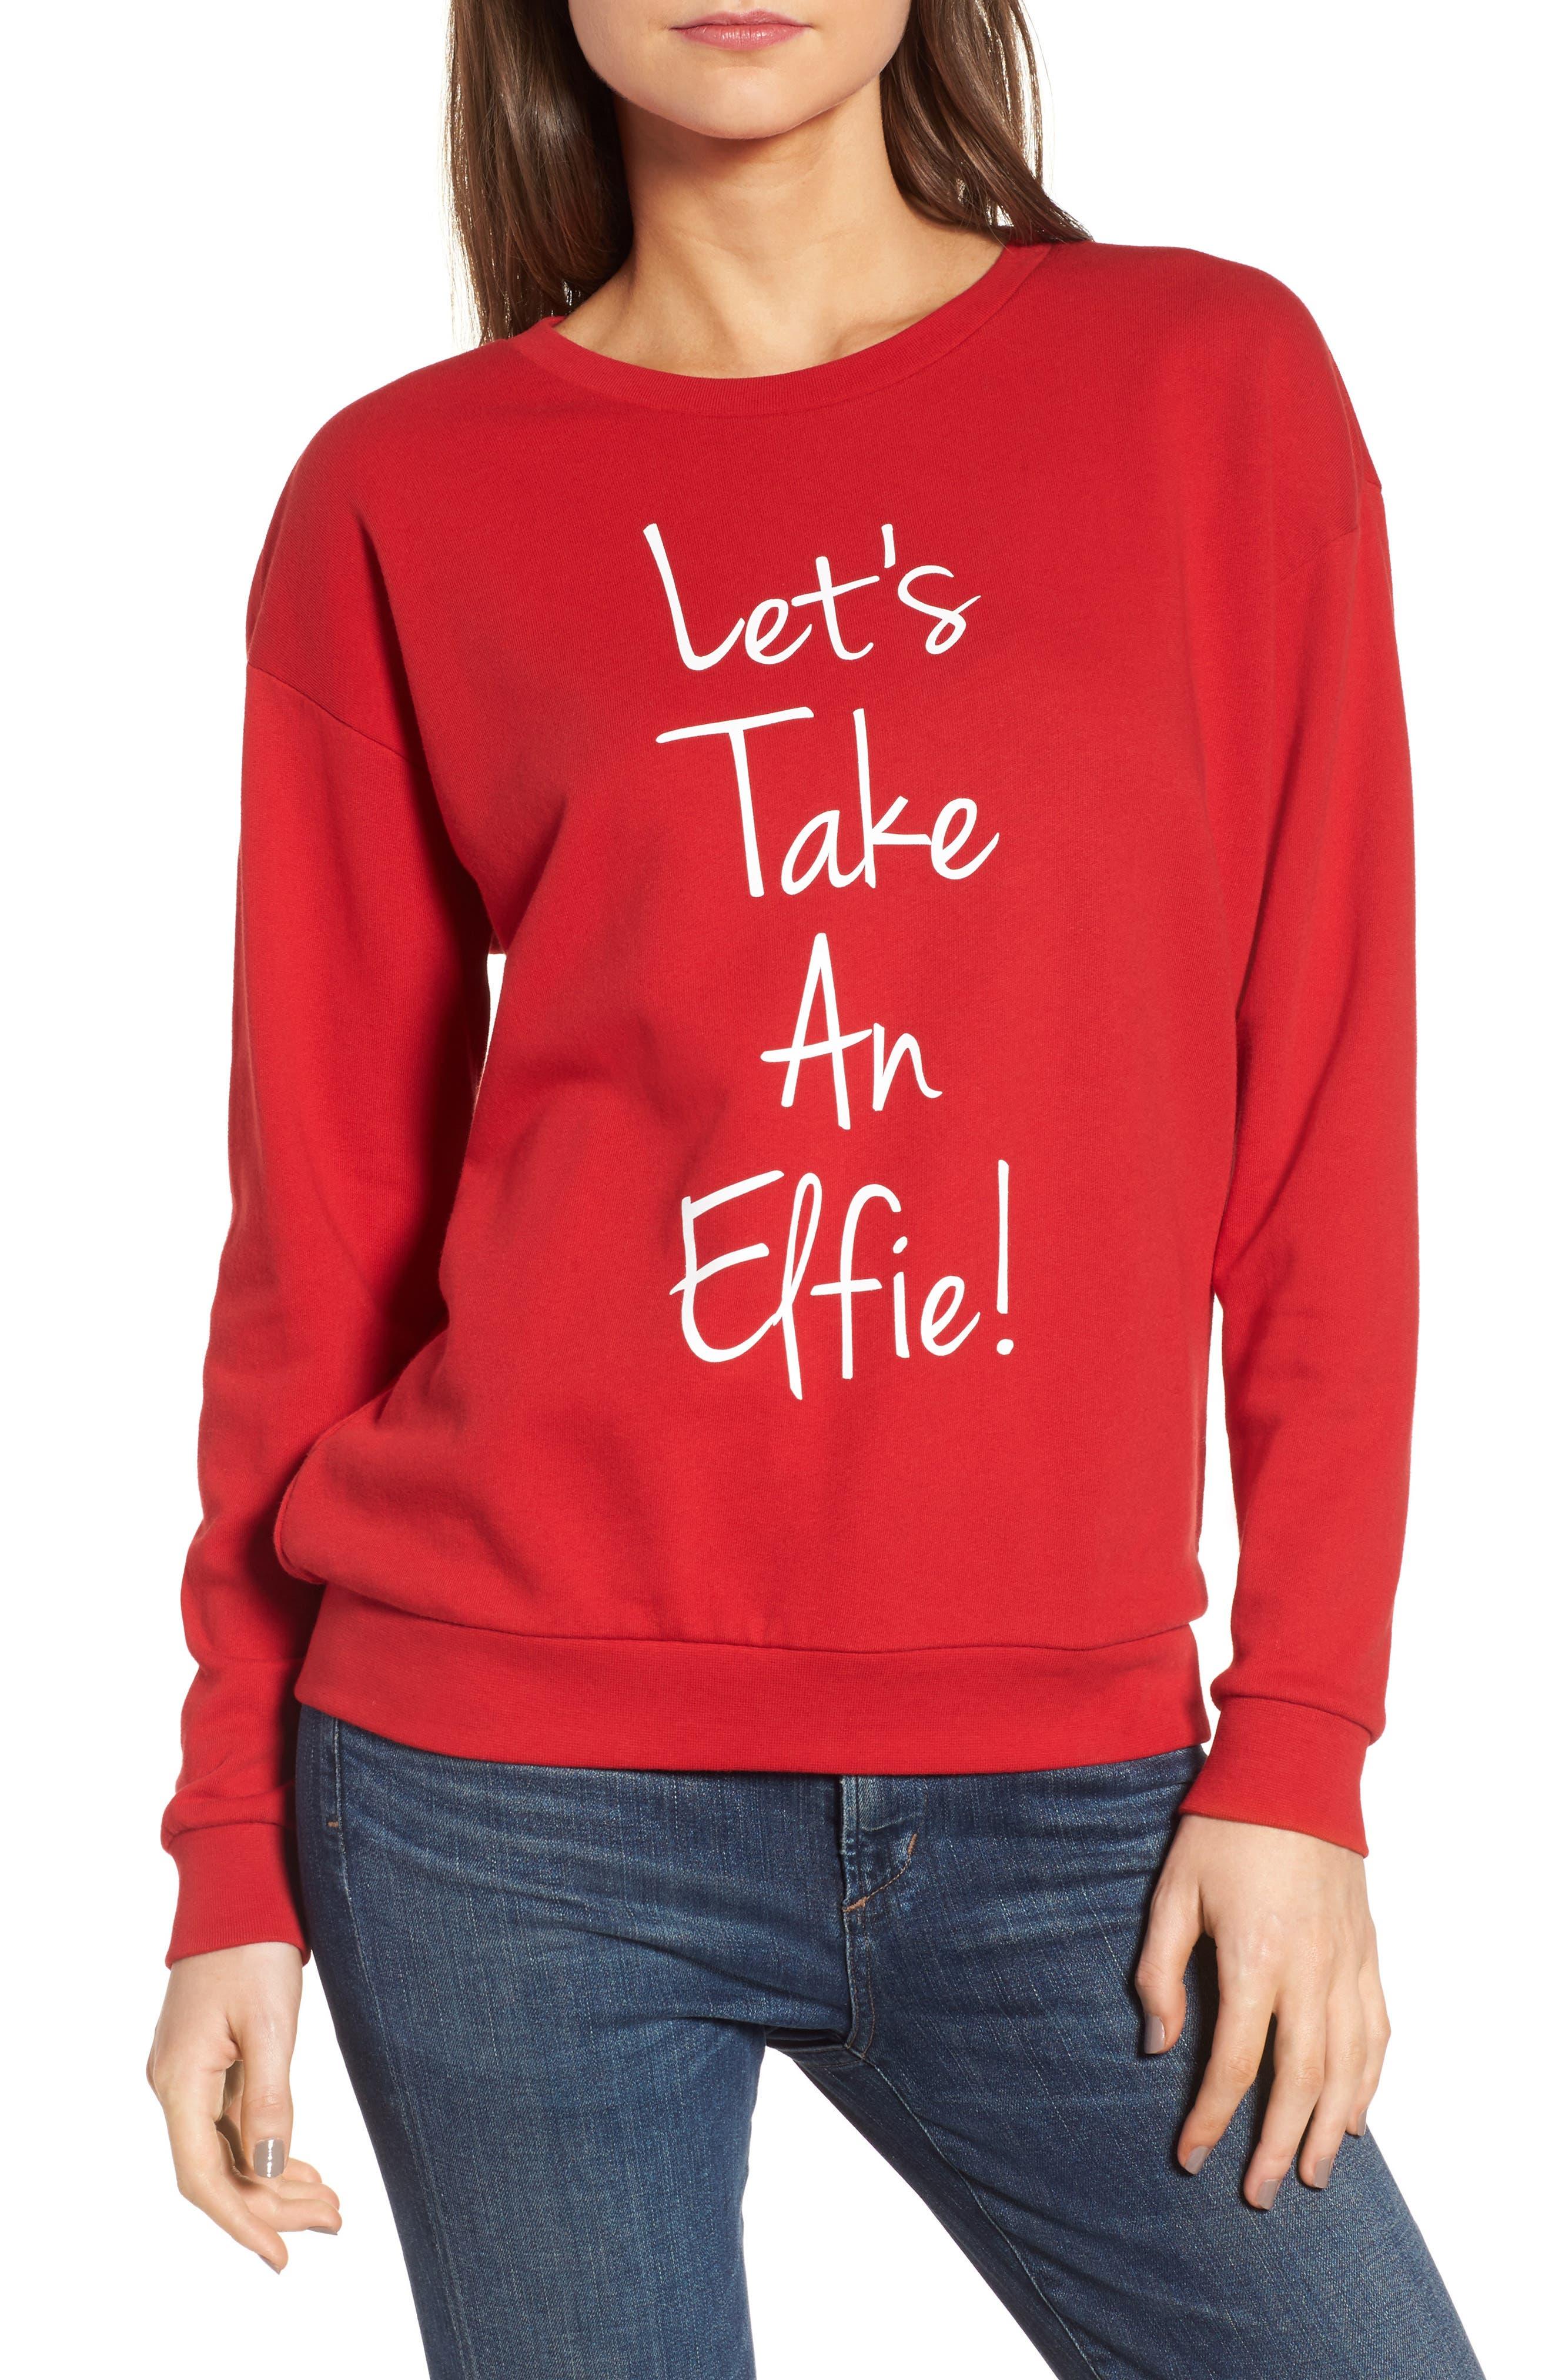 Let's Take an Elfie Sweatshirt,                             Main thumbnail 1, color,                             600